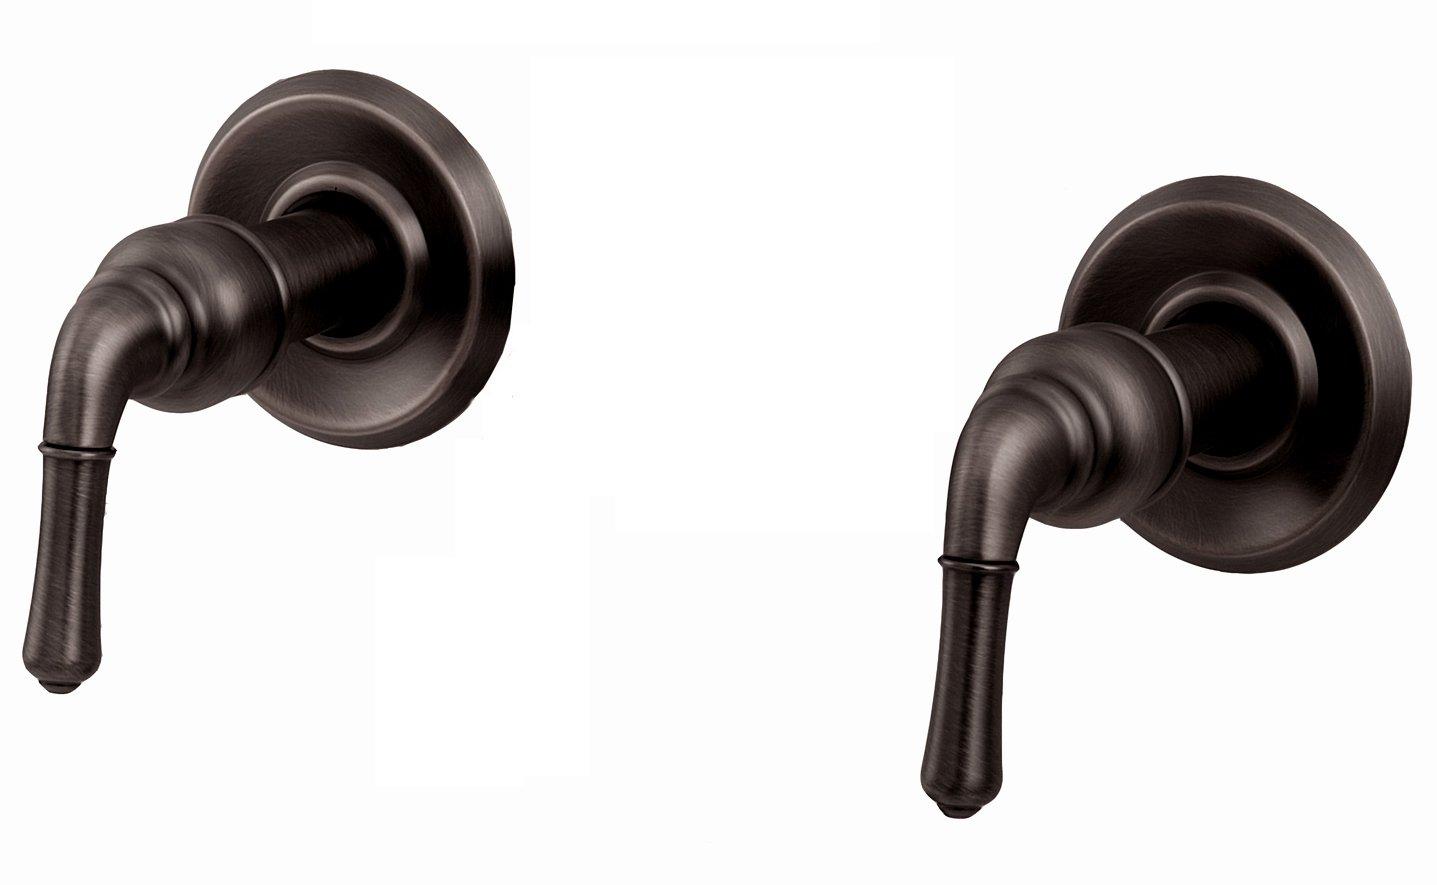 Amazon.com: Trim Kit for 2-handle Shower Valve, Fit Delta Washerless ...